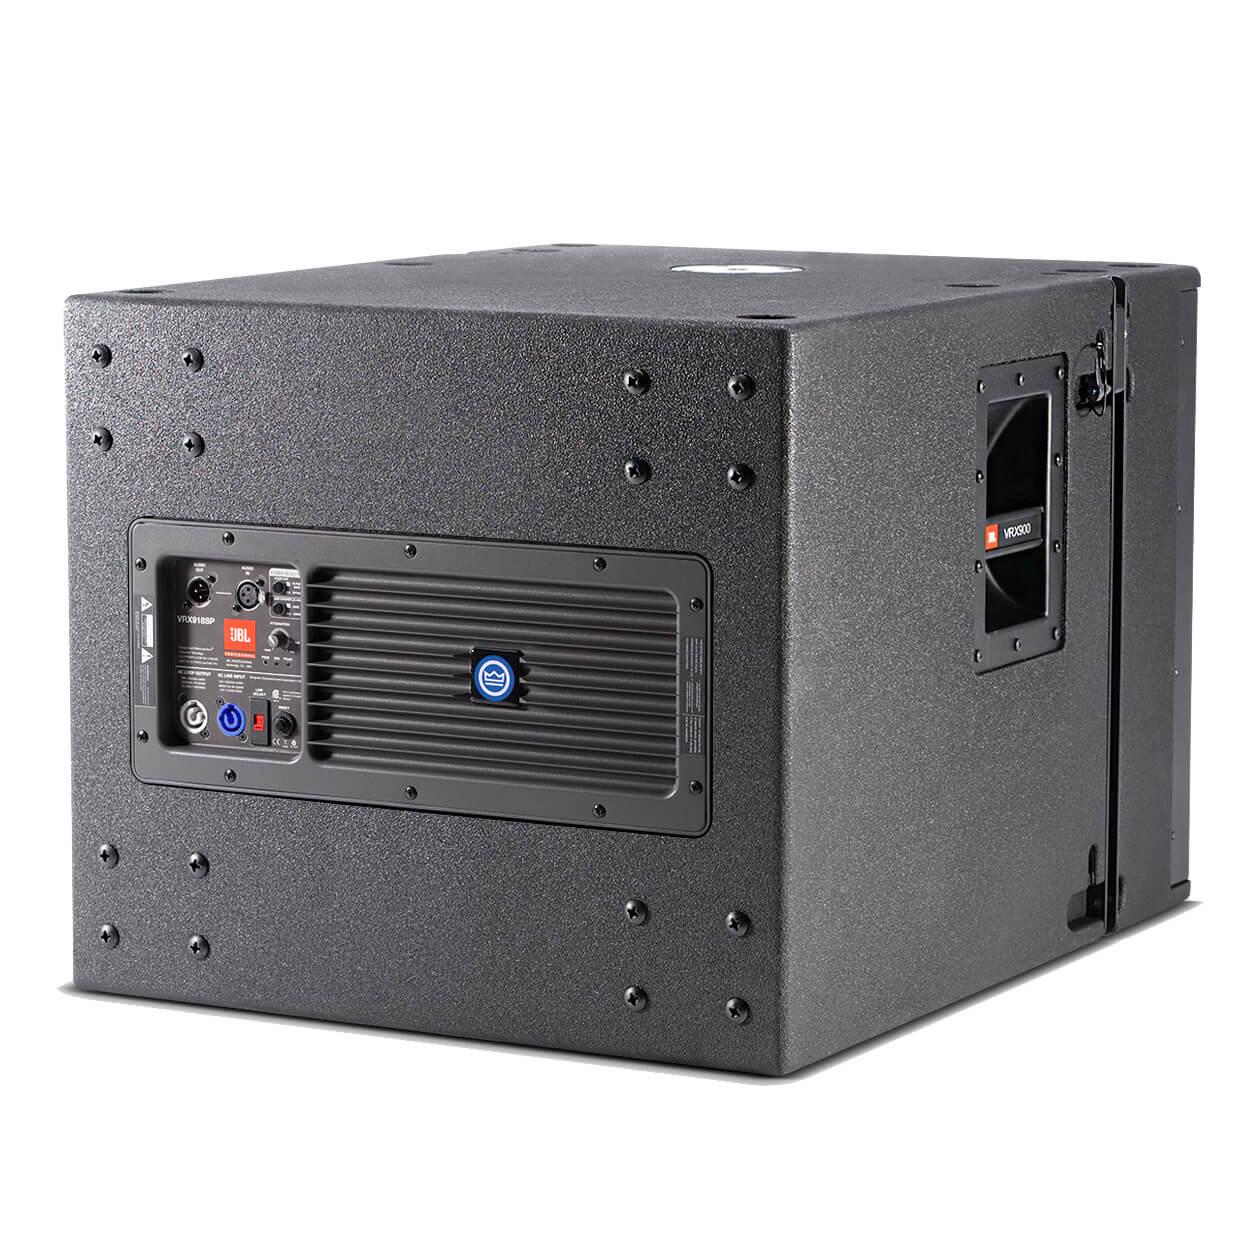 Loa JBL VRX018SP nhập khẩu